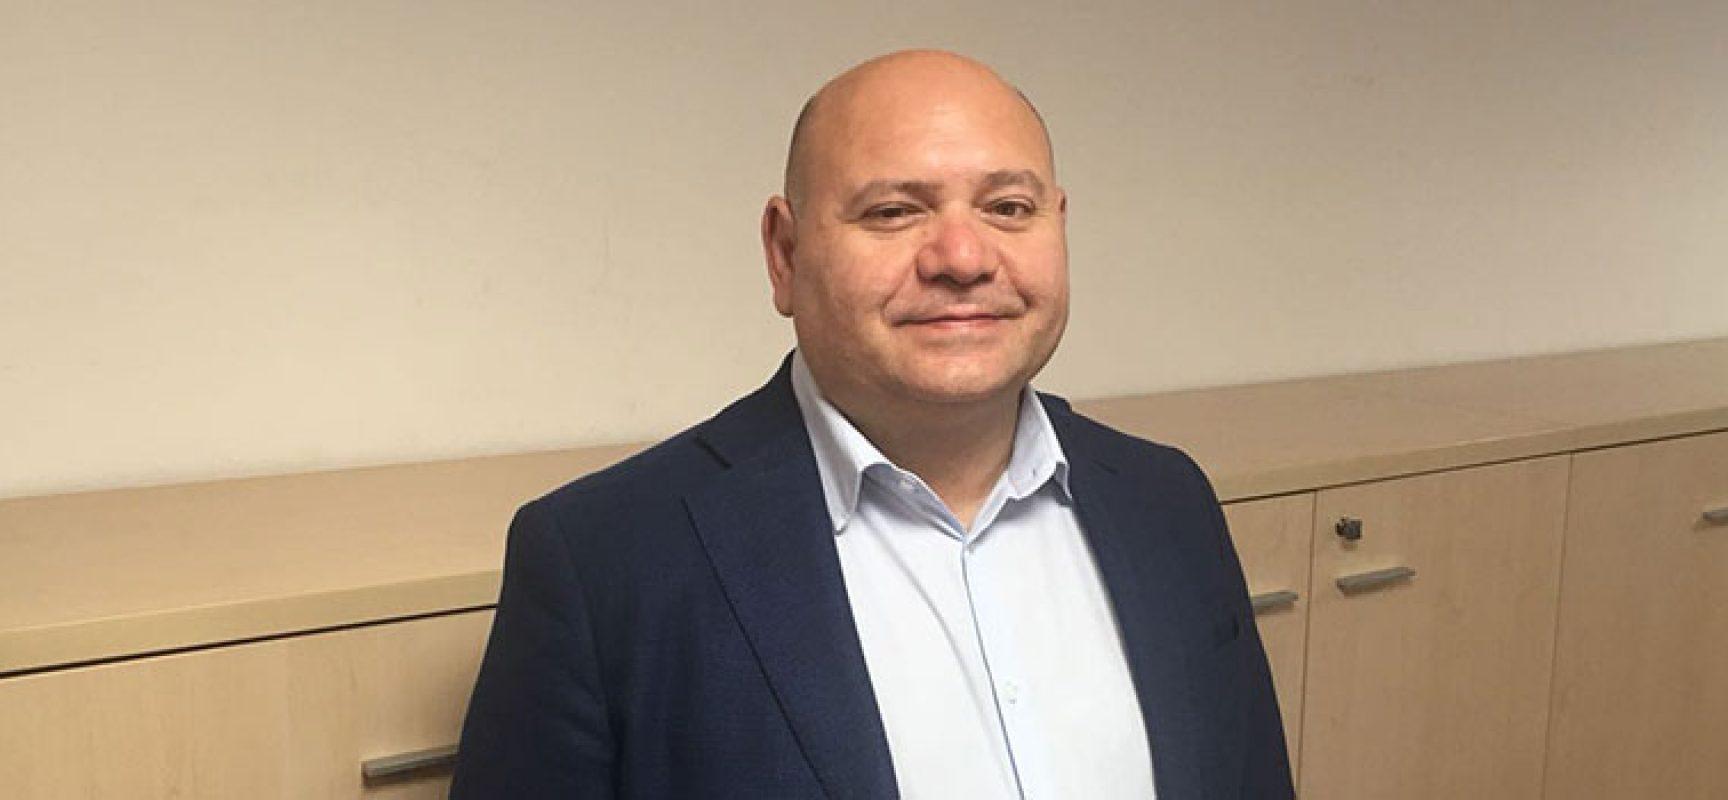 Paolo Carito promotore della partnership tra Lega Pro e George Washington University